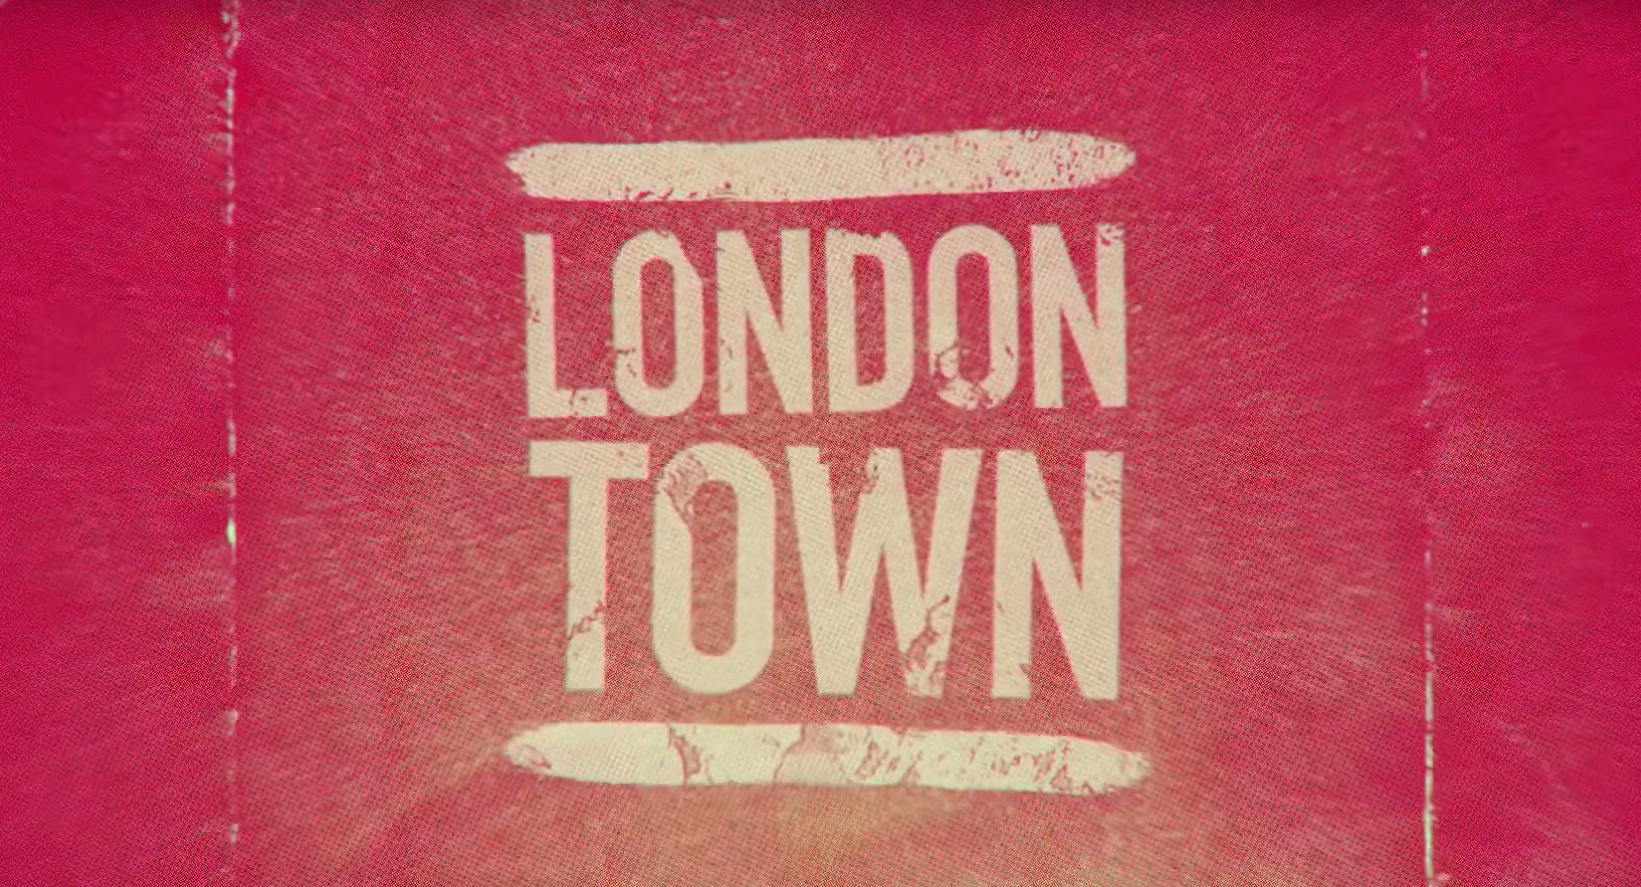 London town Trailer -